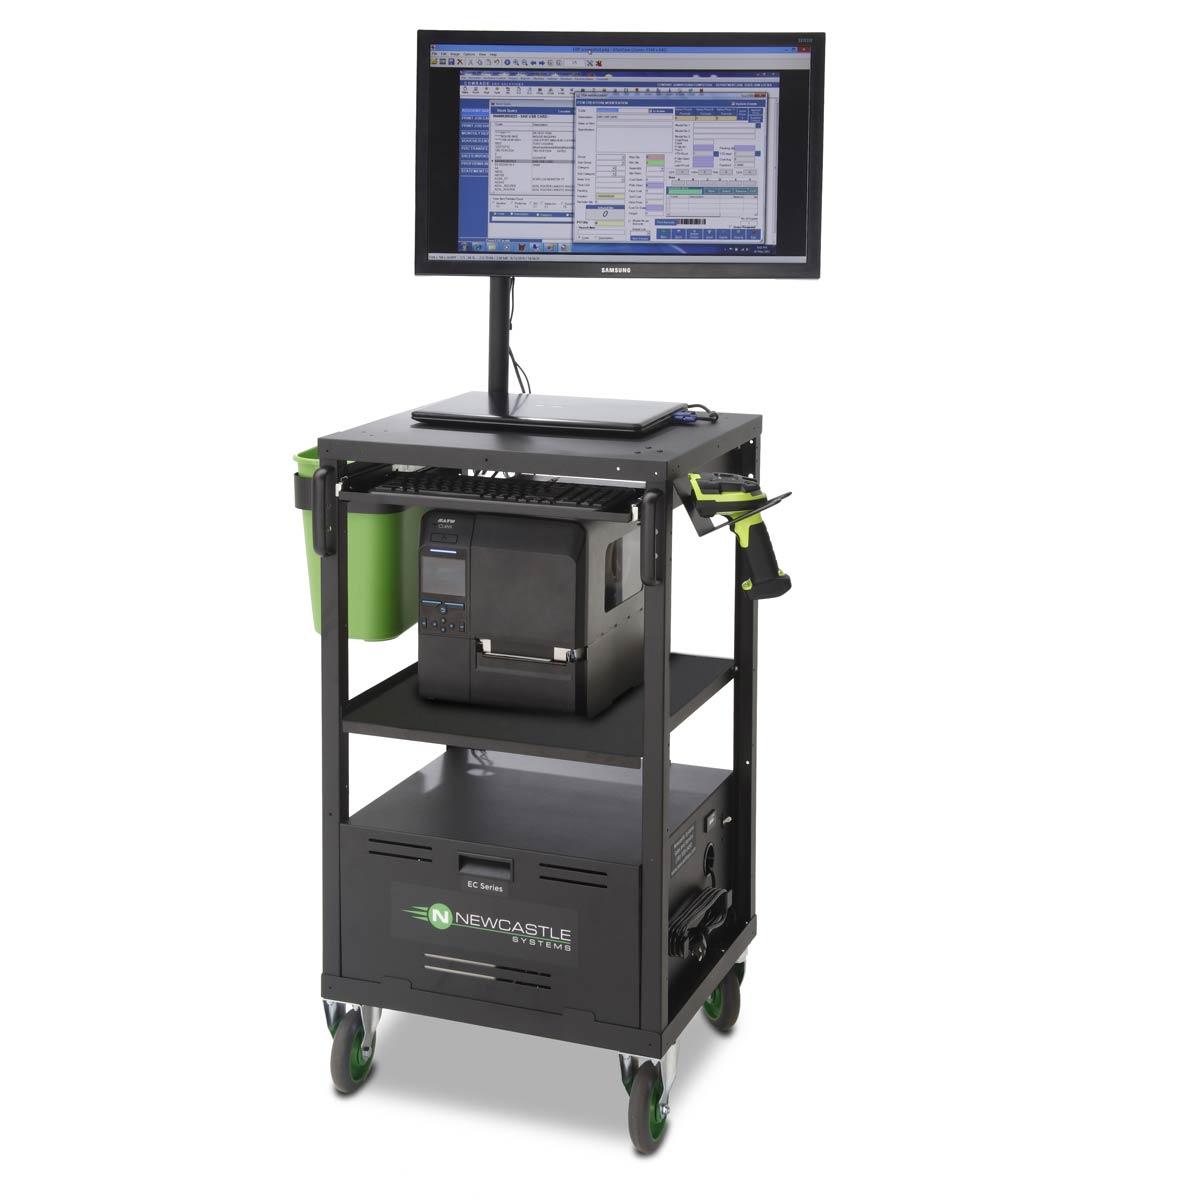 NewCastle EcoCart Mobile Workstation EC380